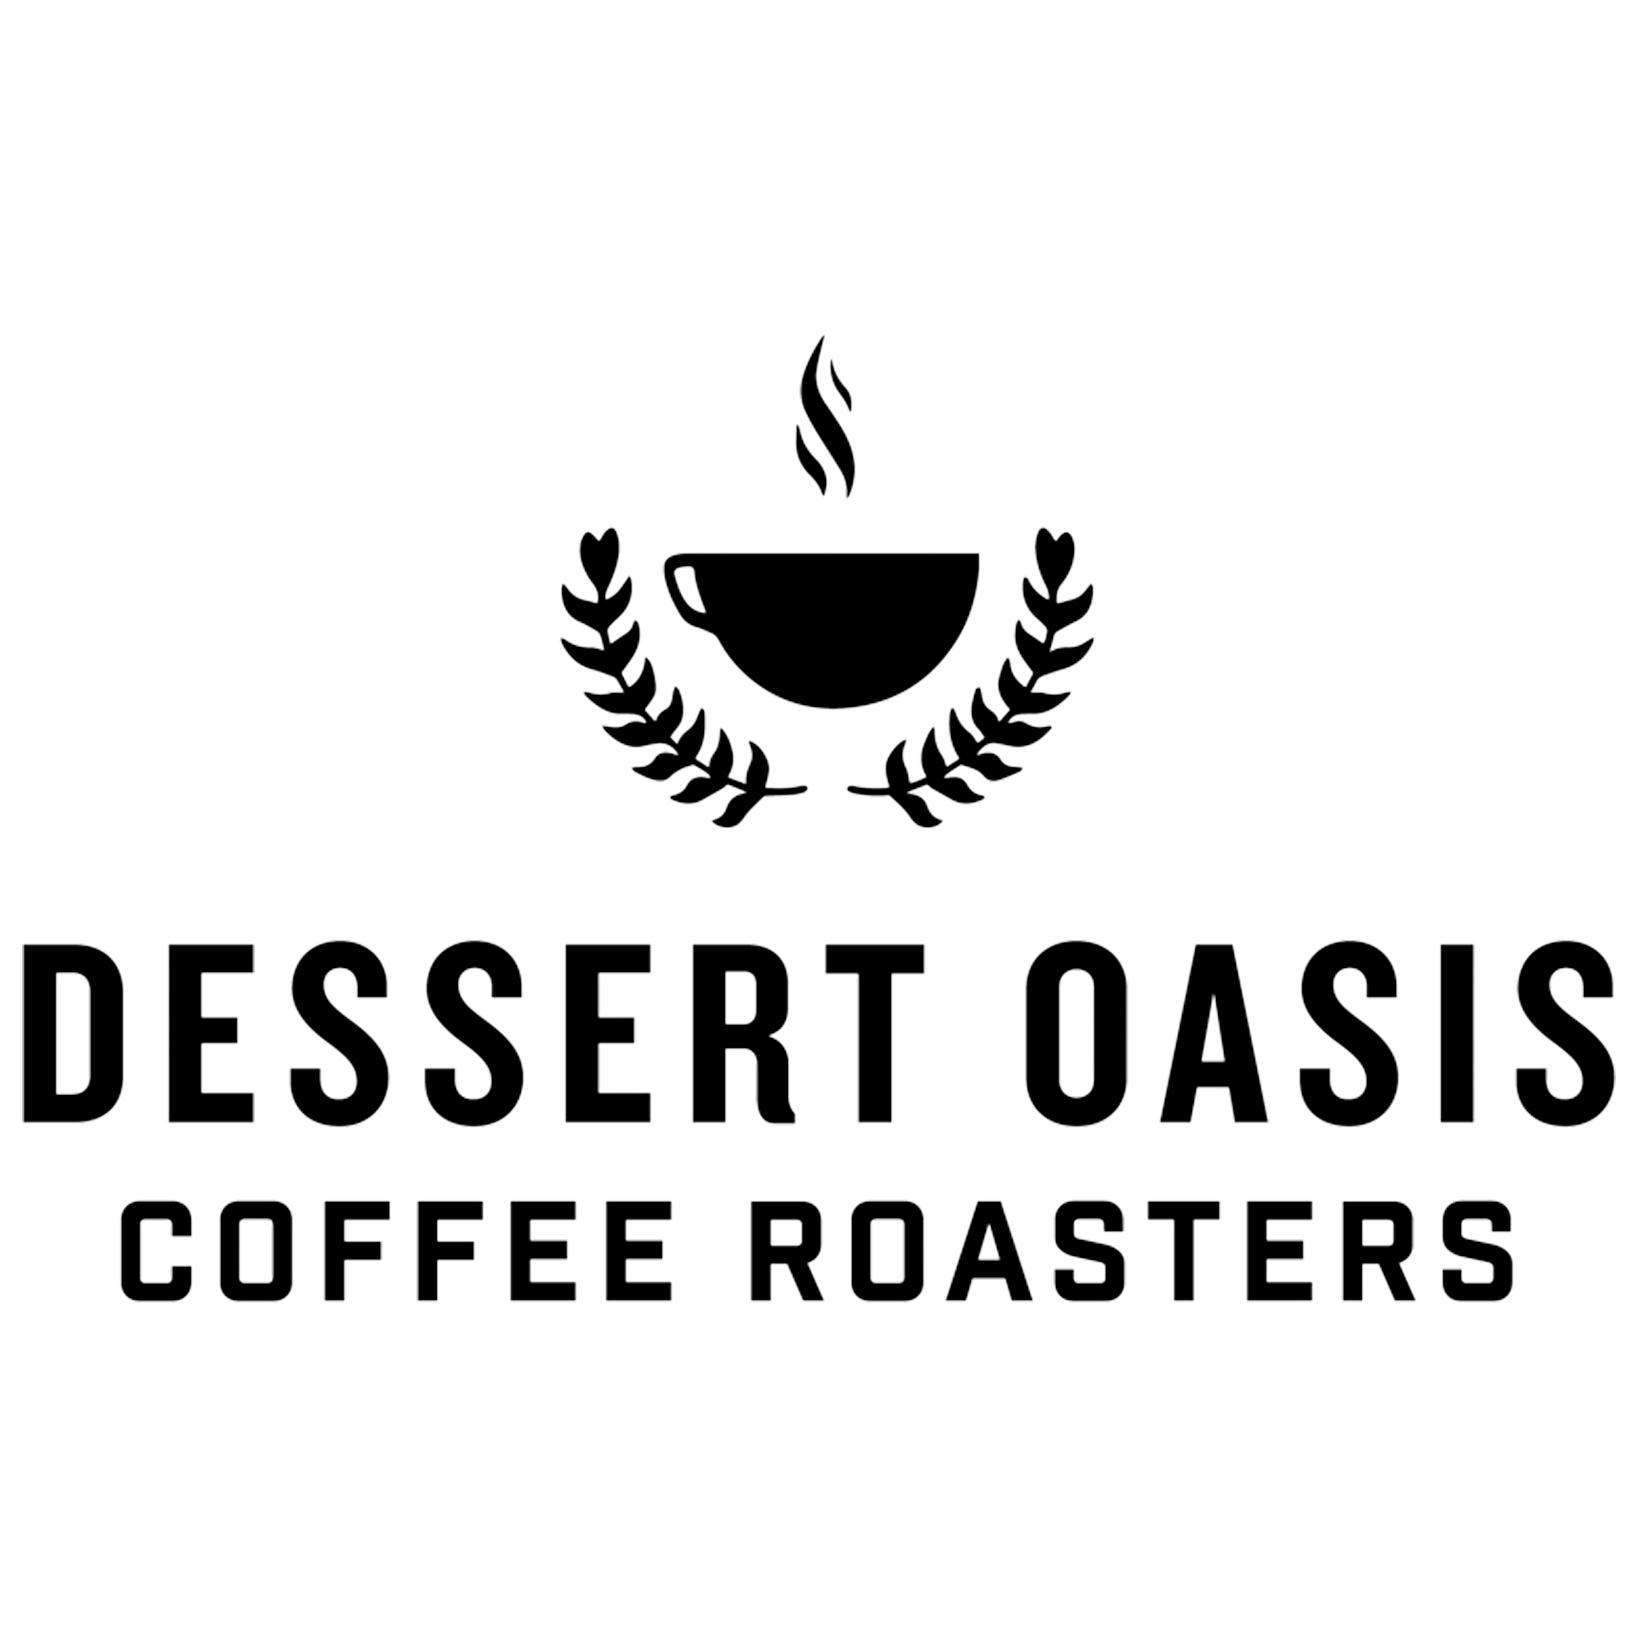 Dessert Oasis   115 S Main St, Royal Oak, MI 48067